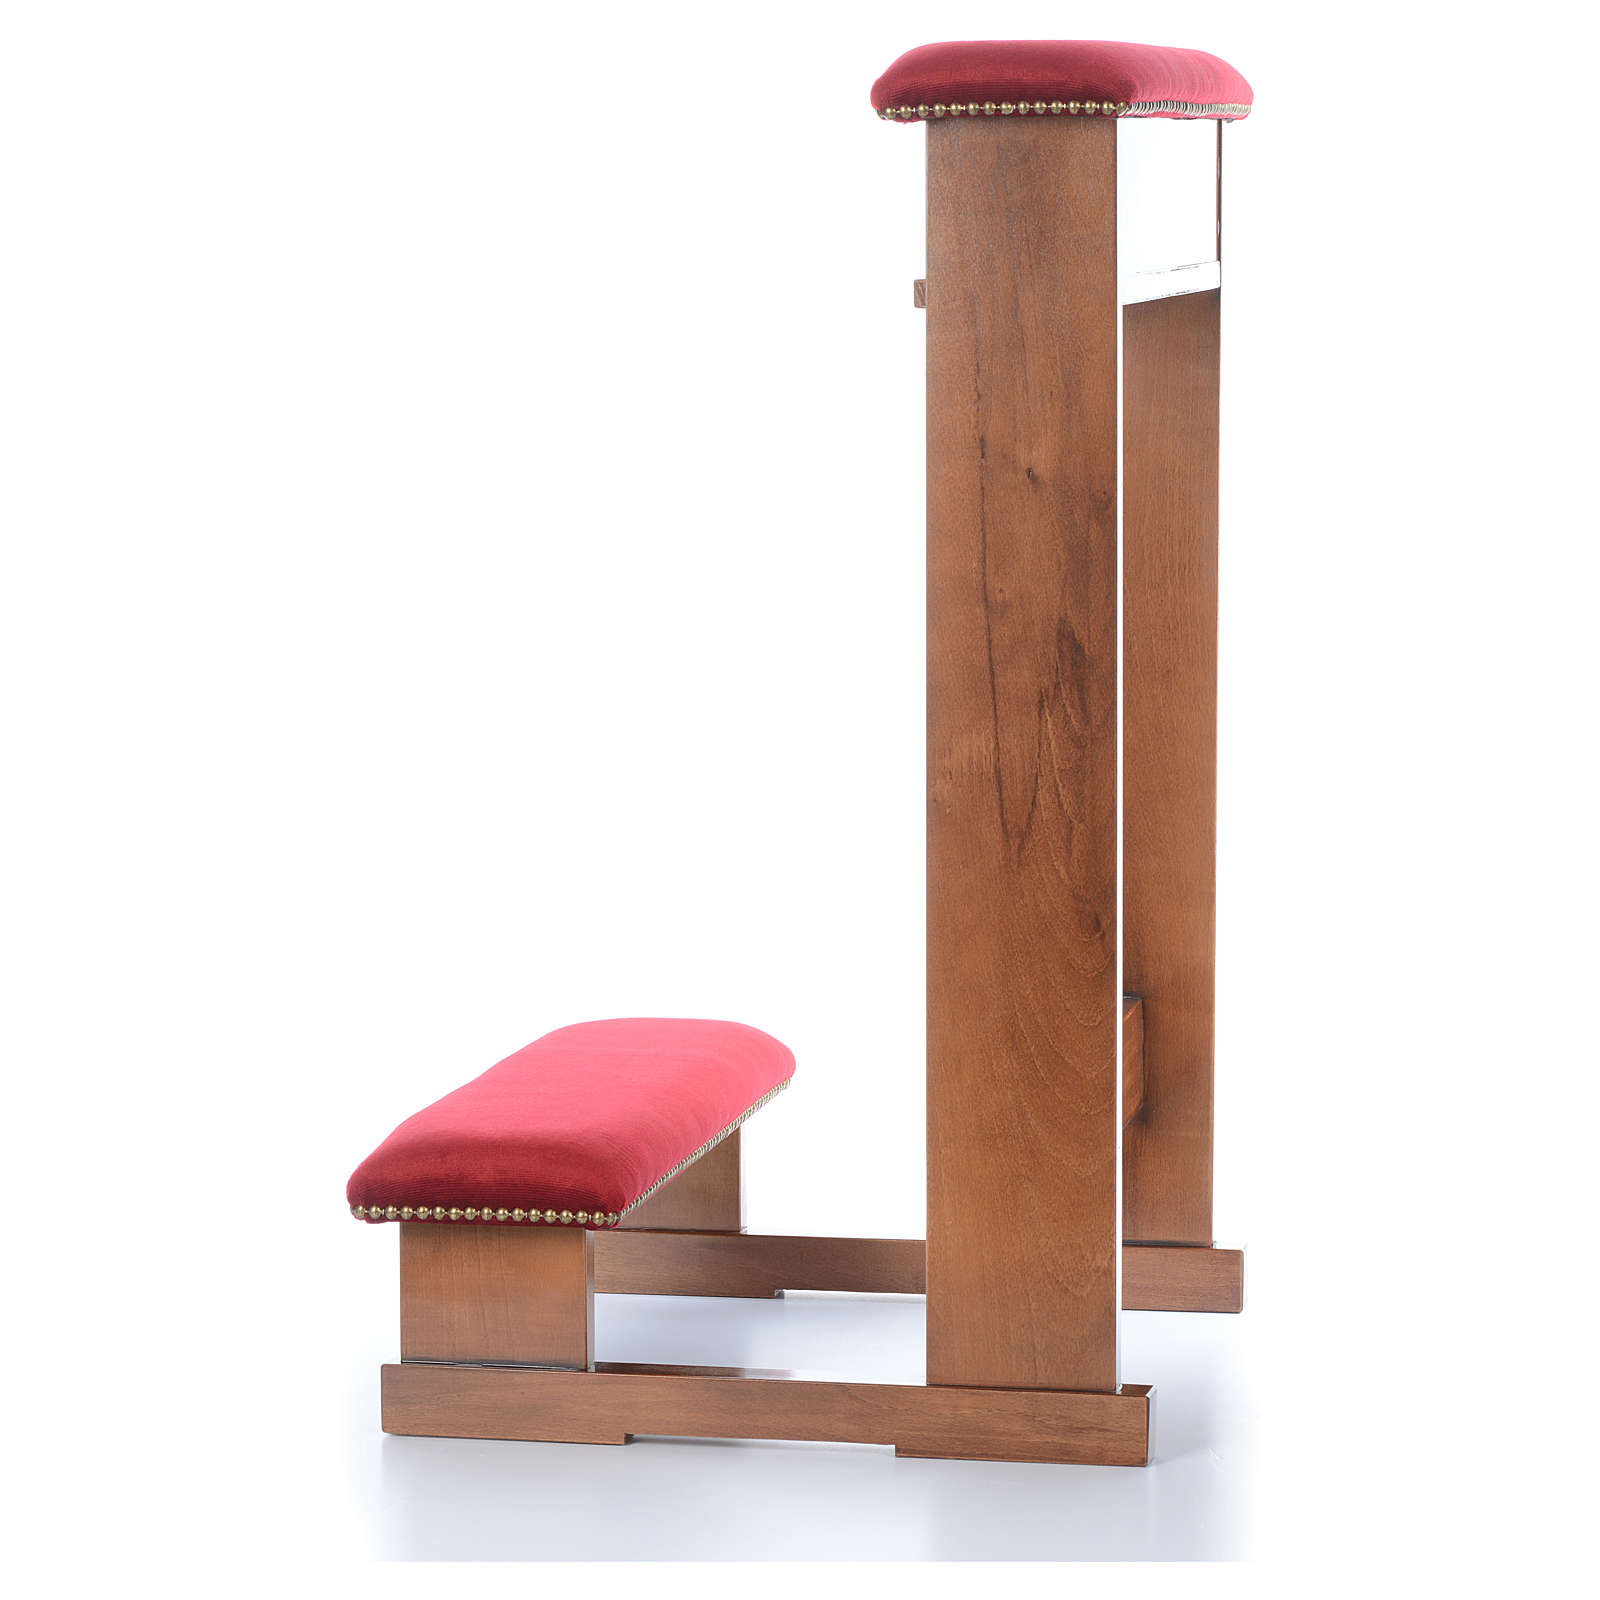 Prie-Dieu mod. 'Assisi' marron clair tissu rouge 4